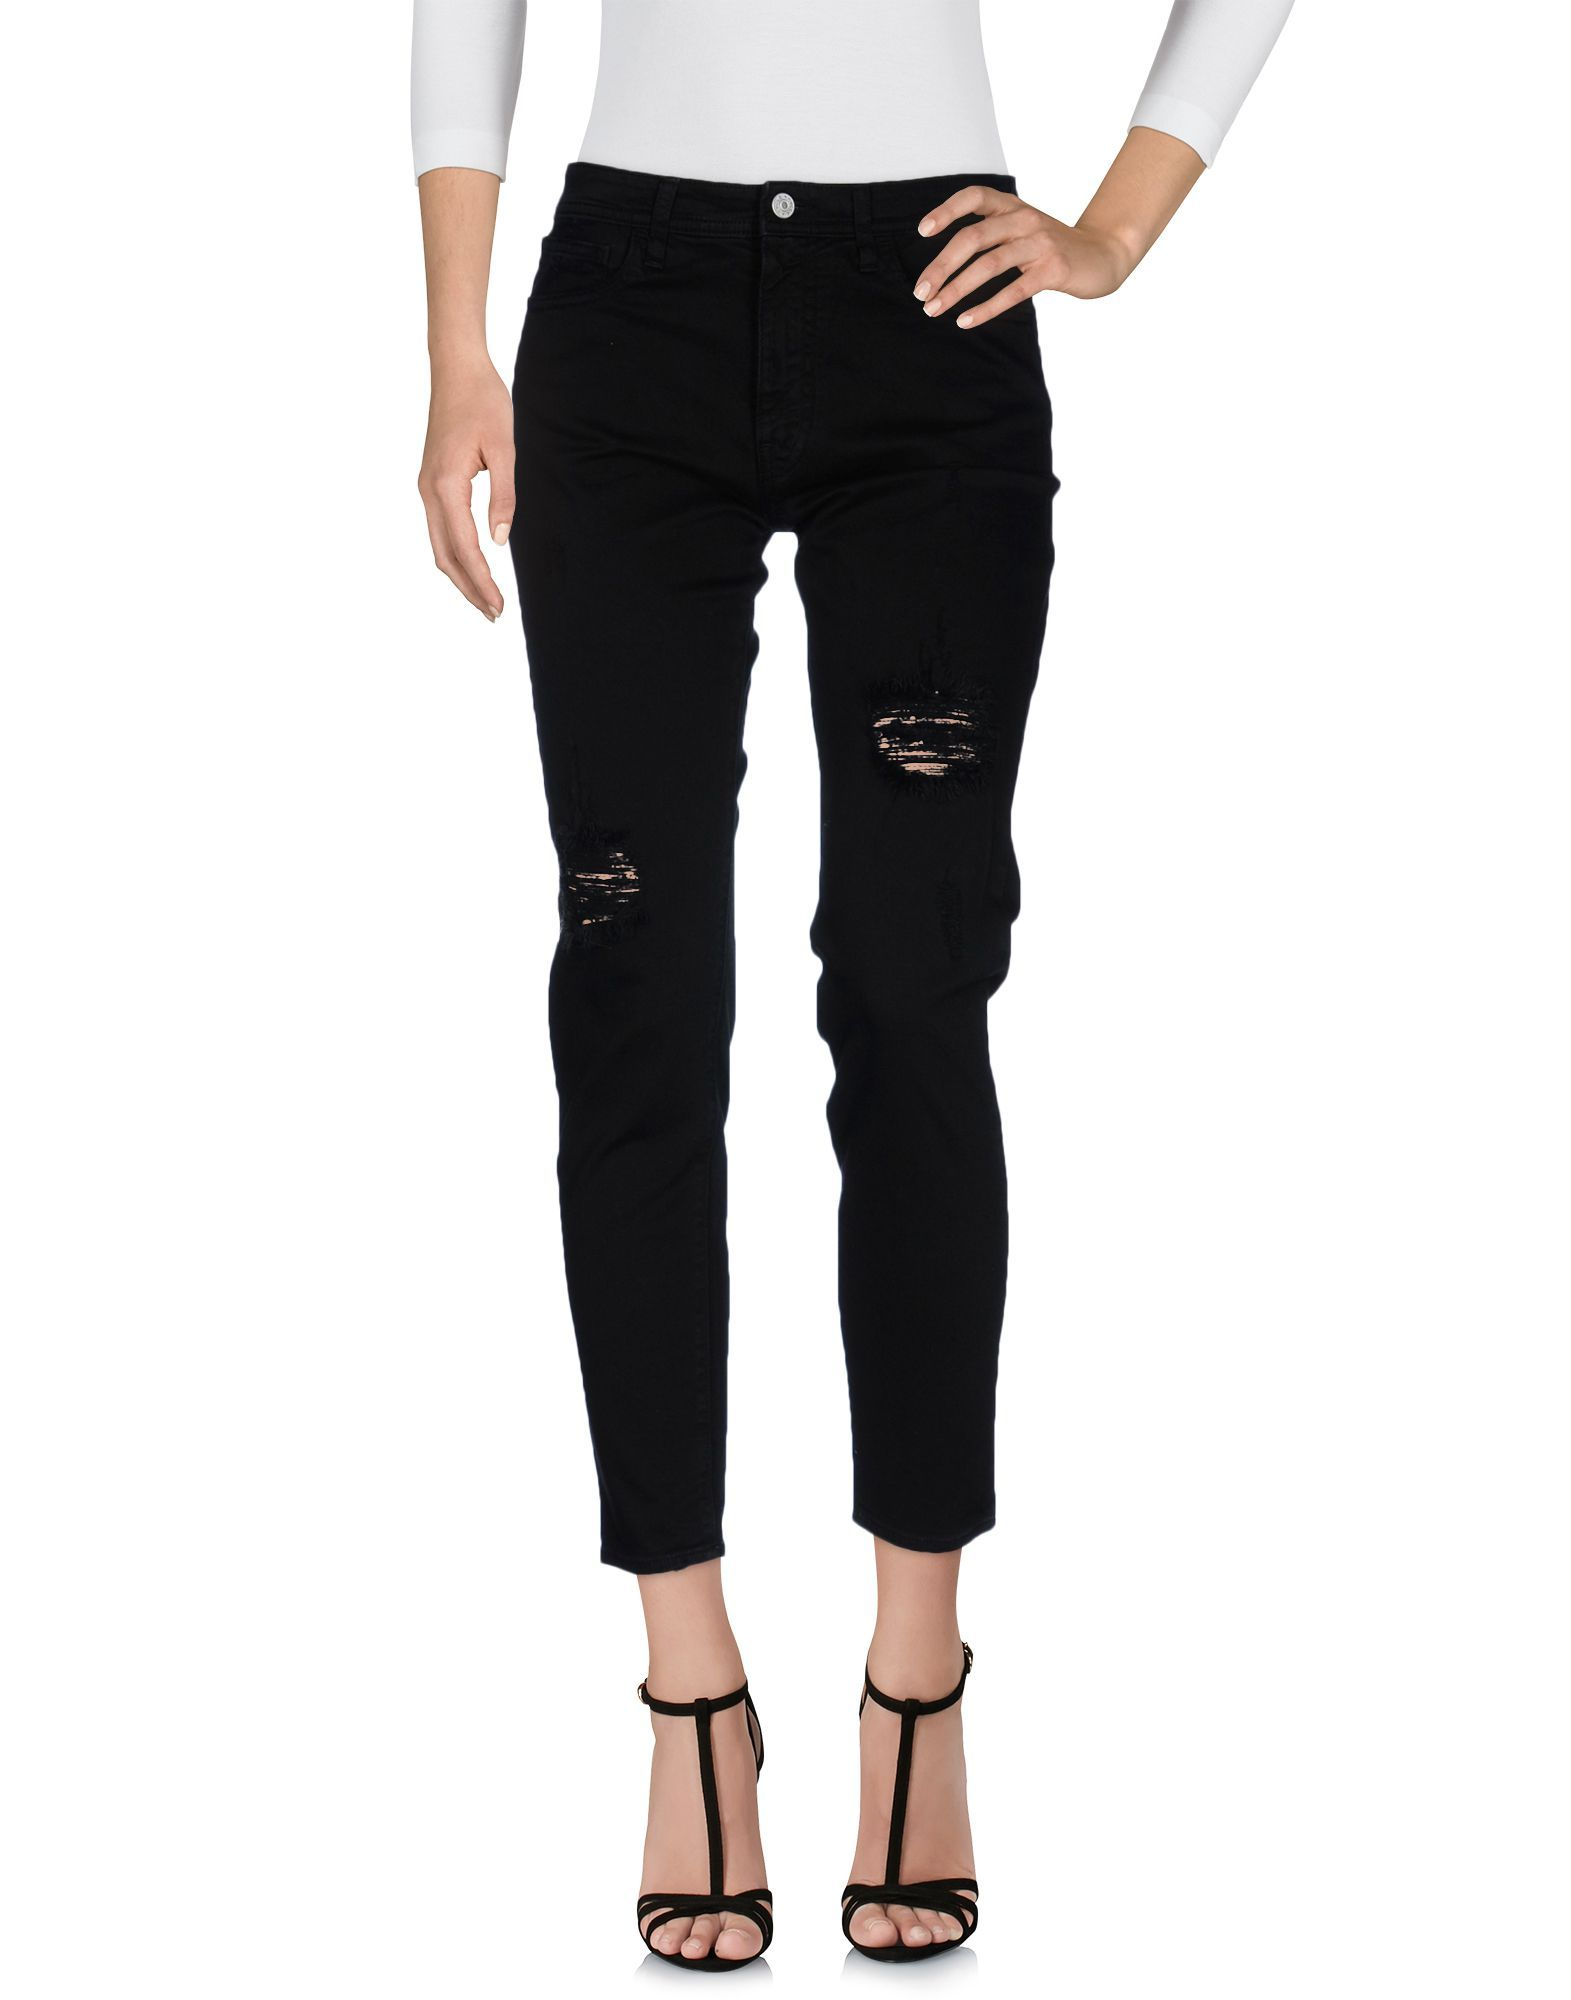 Cycle Black Cotton Jeans